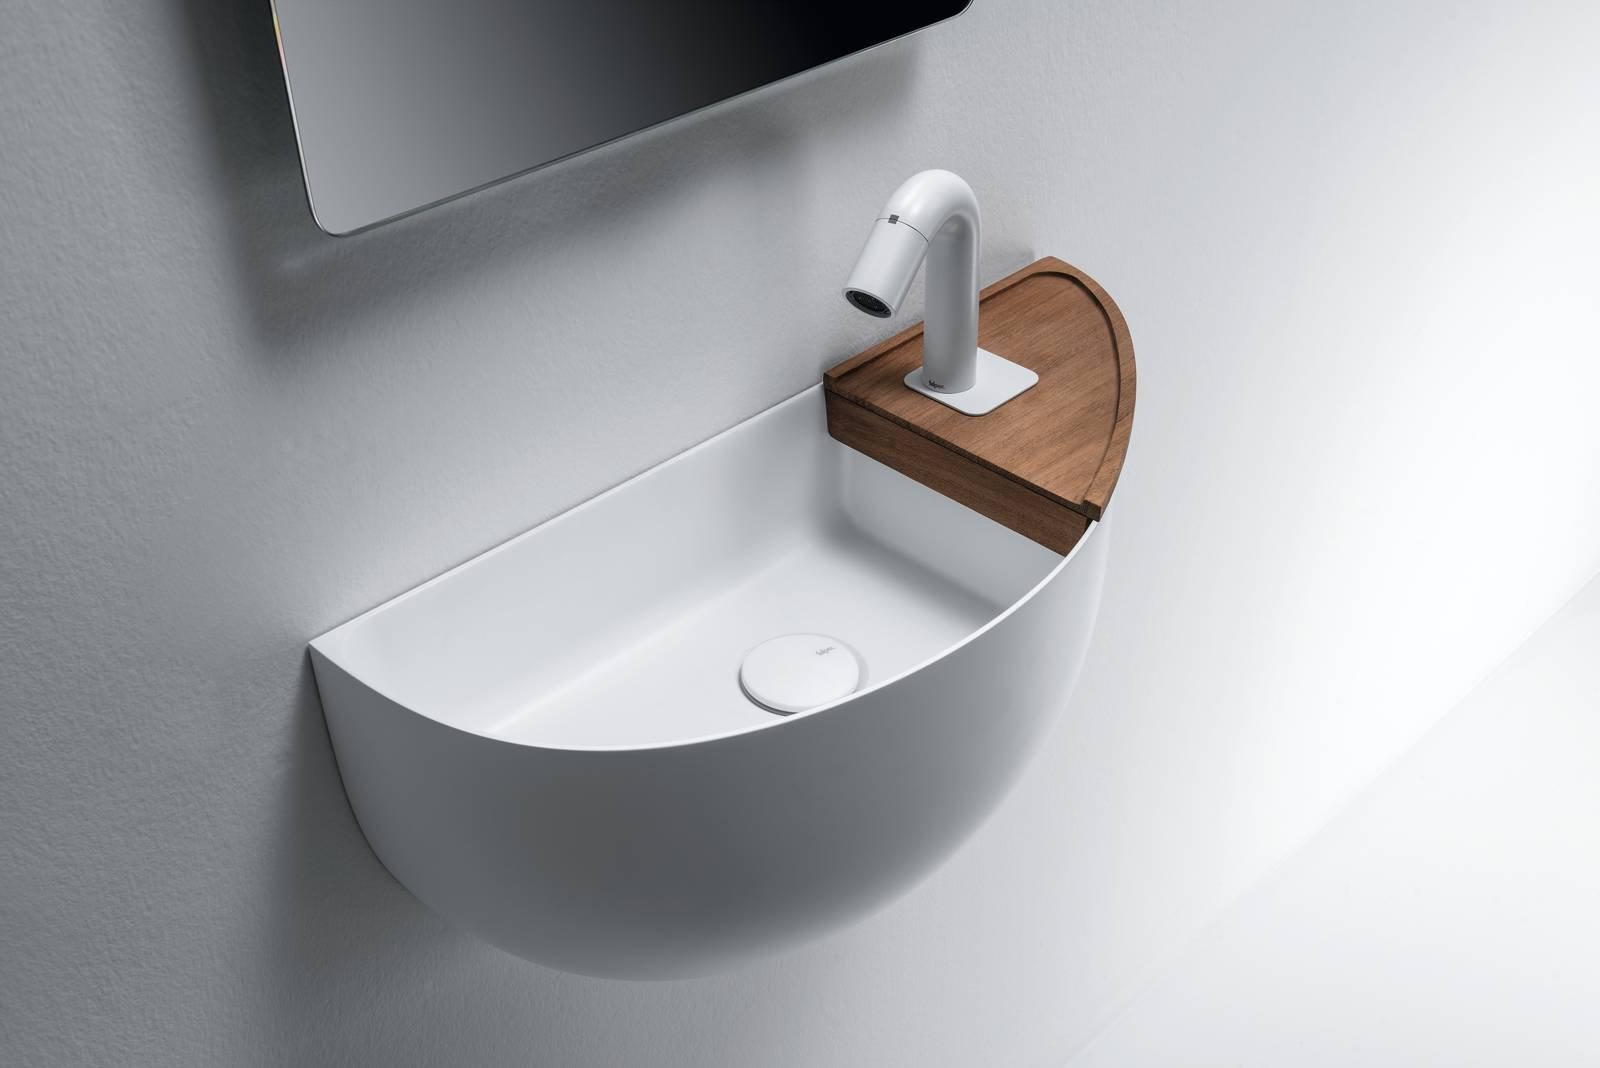 Vasca Da Bagno Quadrata 120x120 : Vasche da bagno quadrate decorazioni e interior design belvor